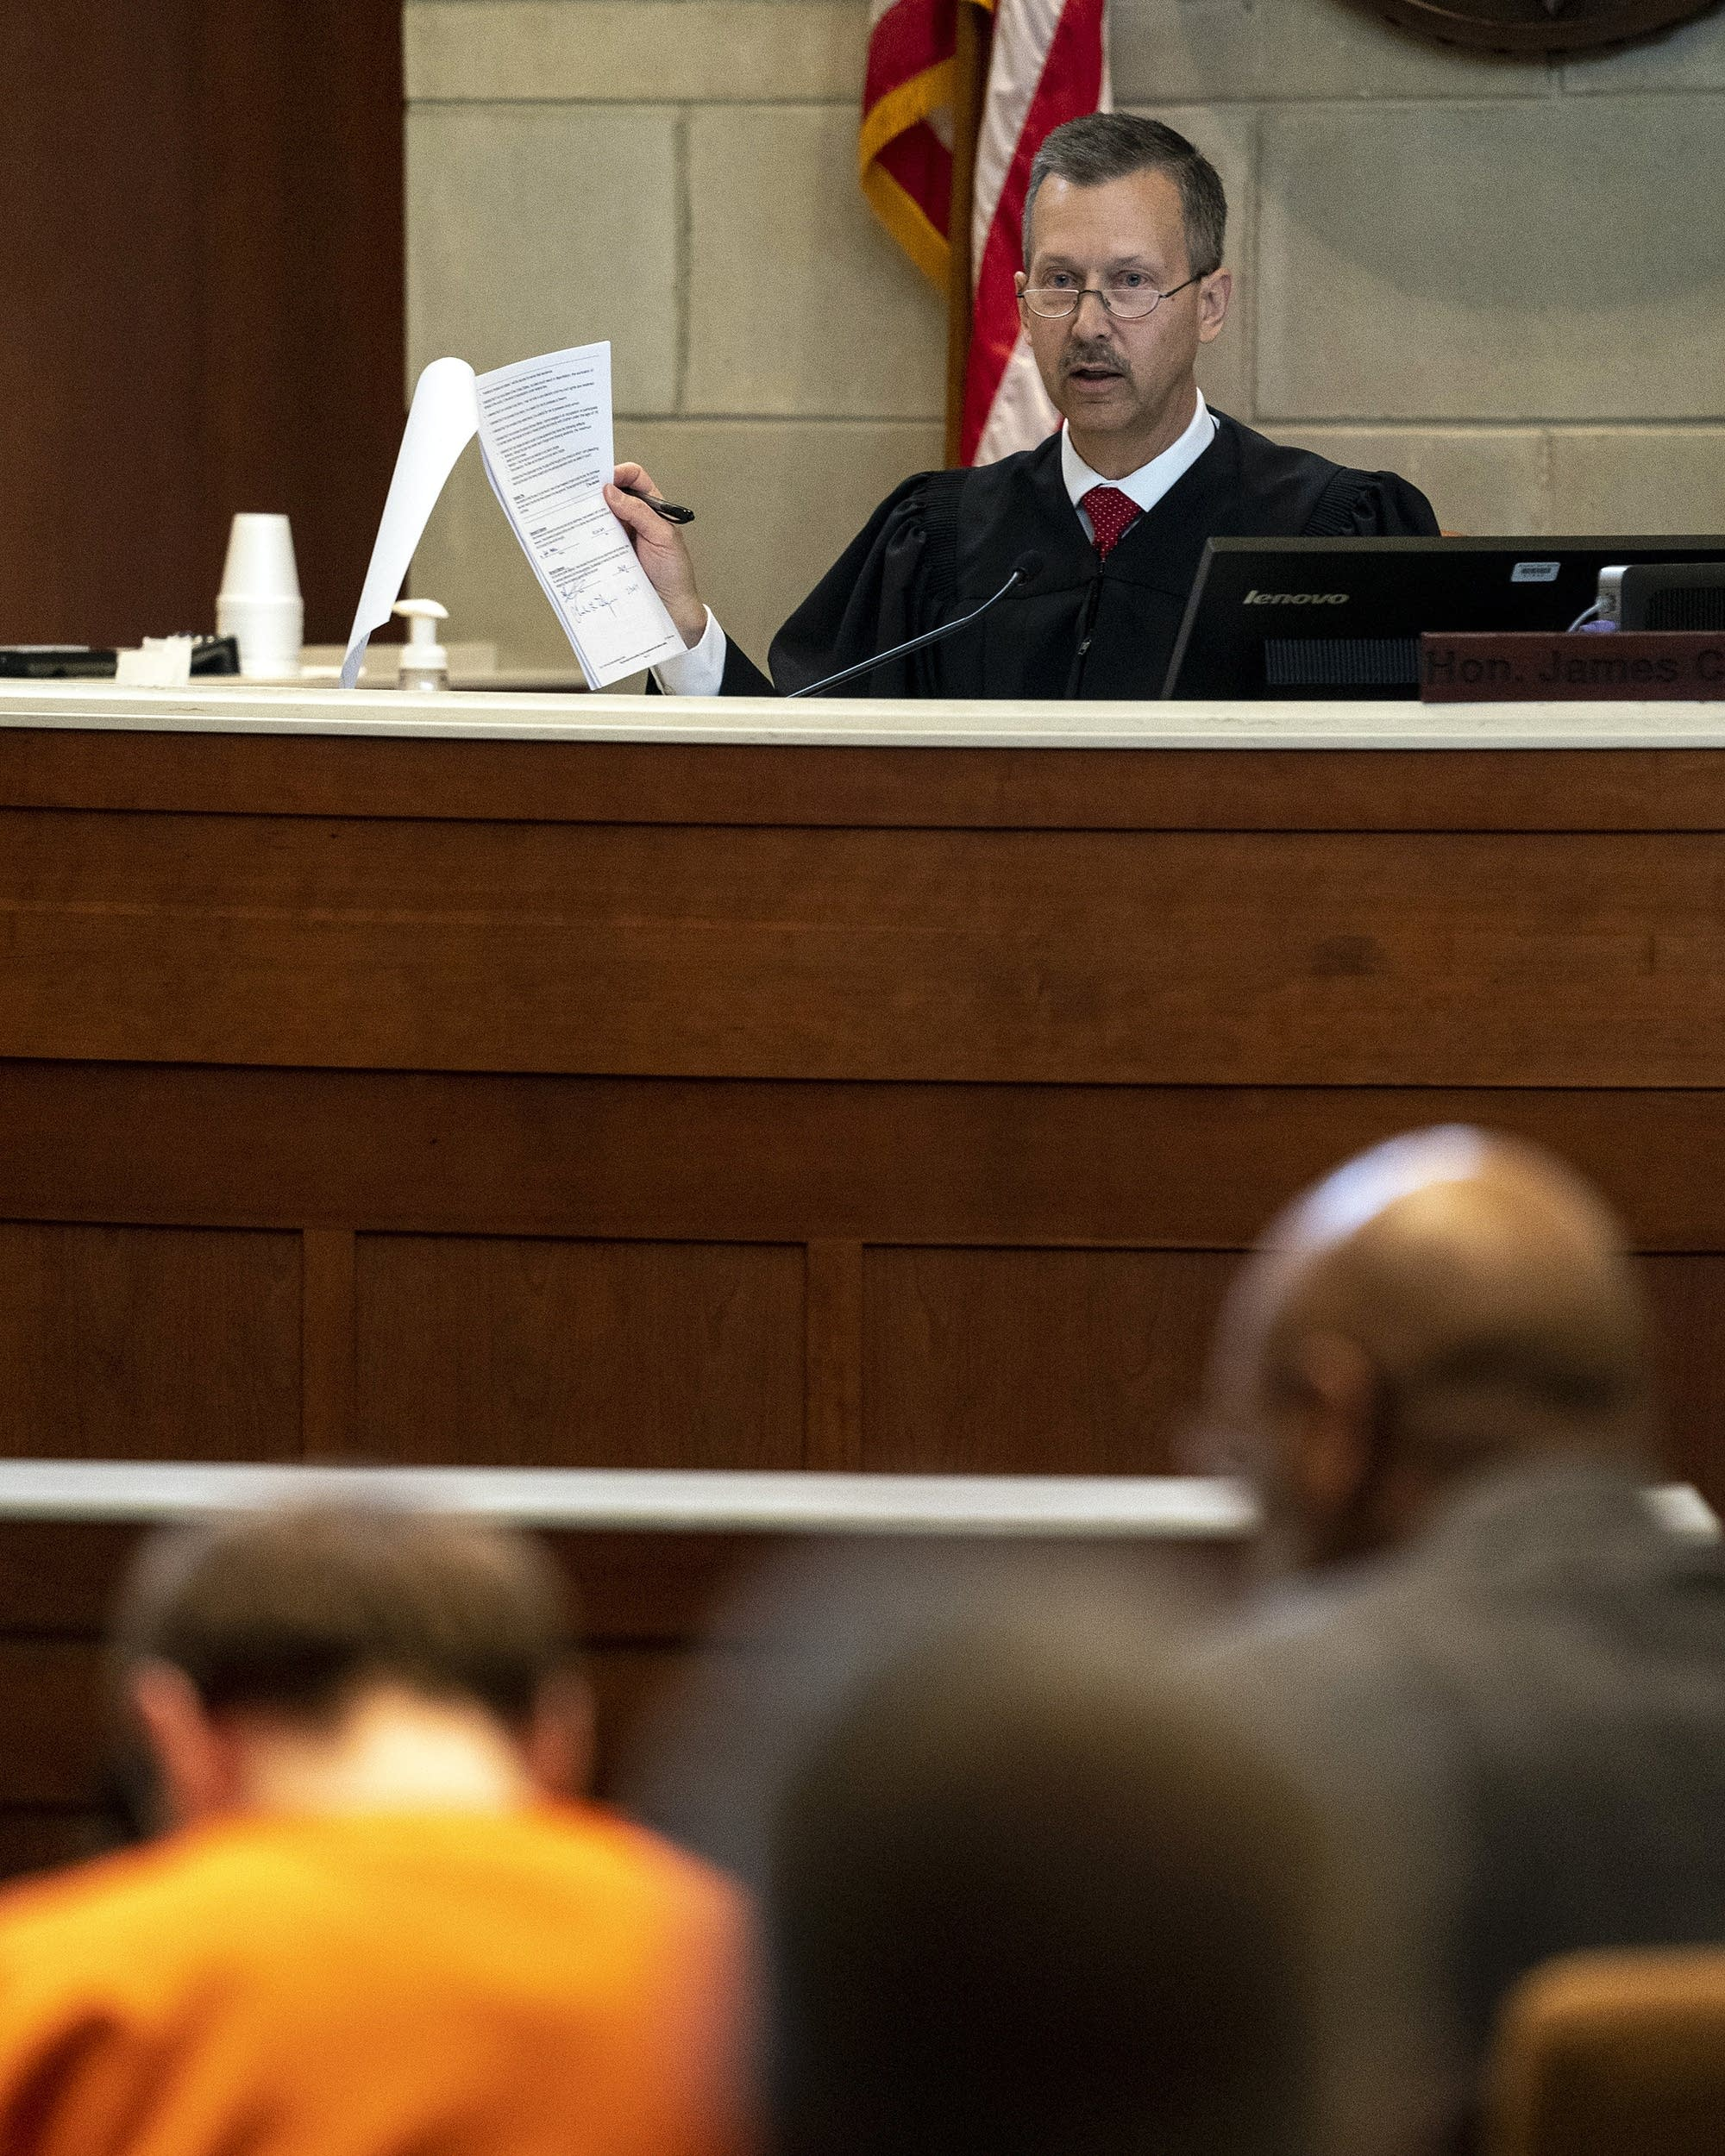 Barron County Judge James Babler speaks to Jake Patterson.